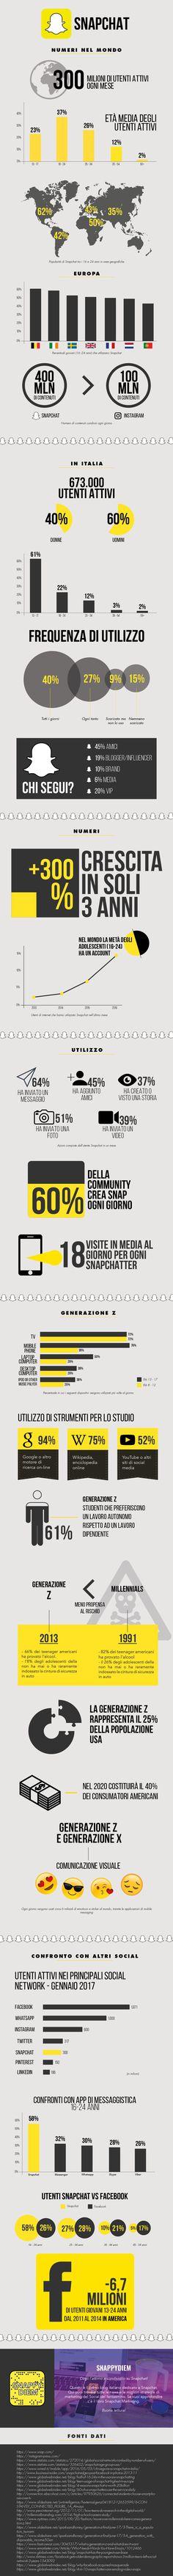 infografica snapchat